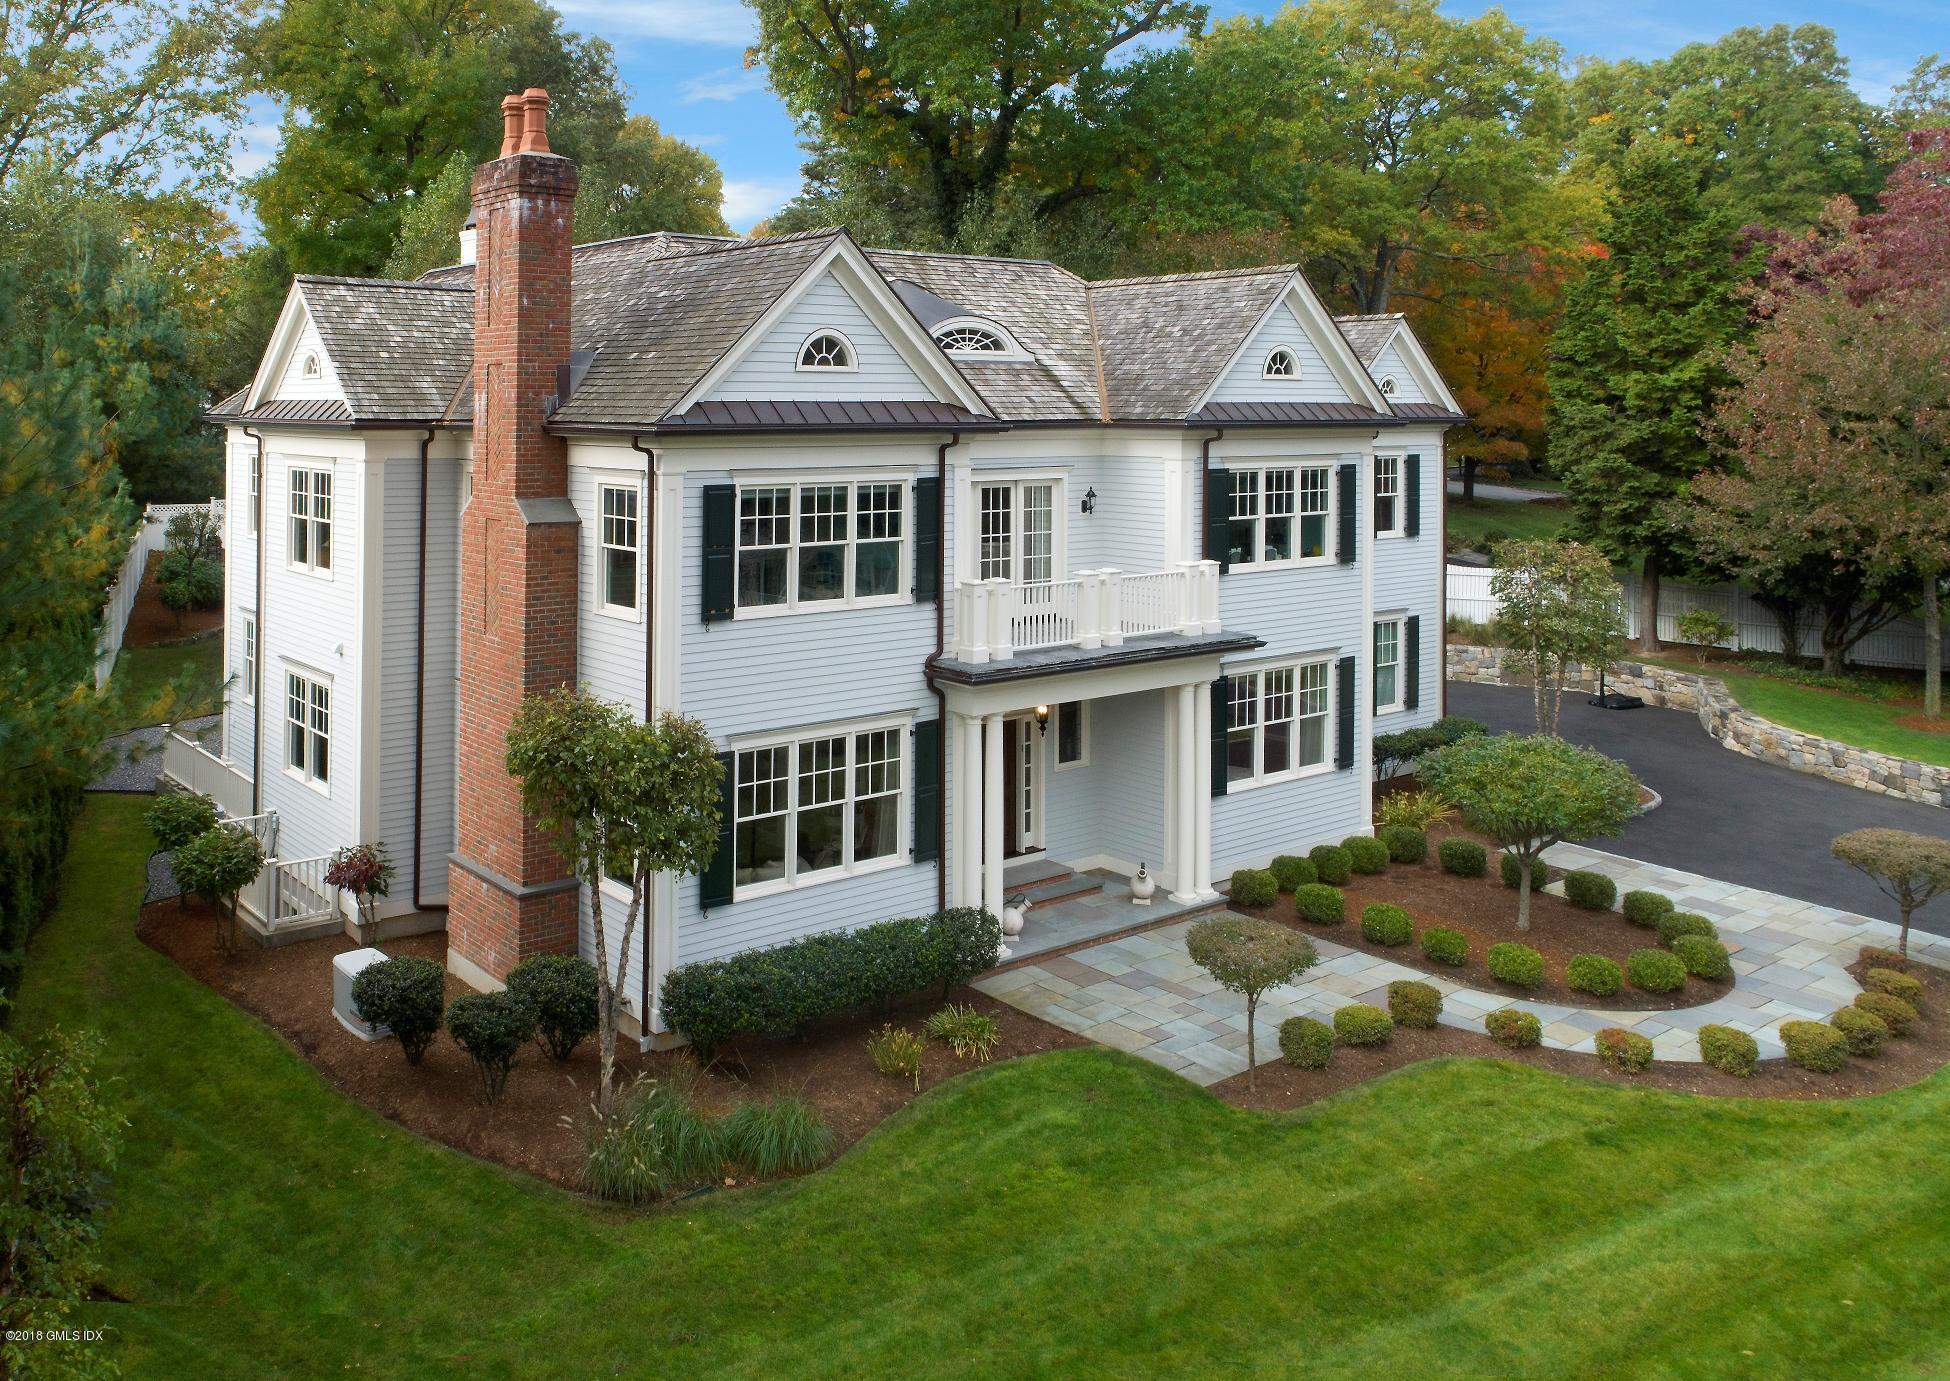 29 Crescent Road,Riverside,Connecticut 06878,7 Bedrooms Bedrooms,7 BathroomsBathrooms,Single family,Crescent,105675